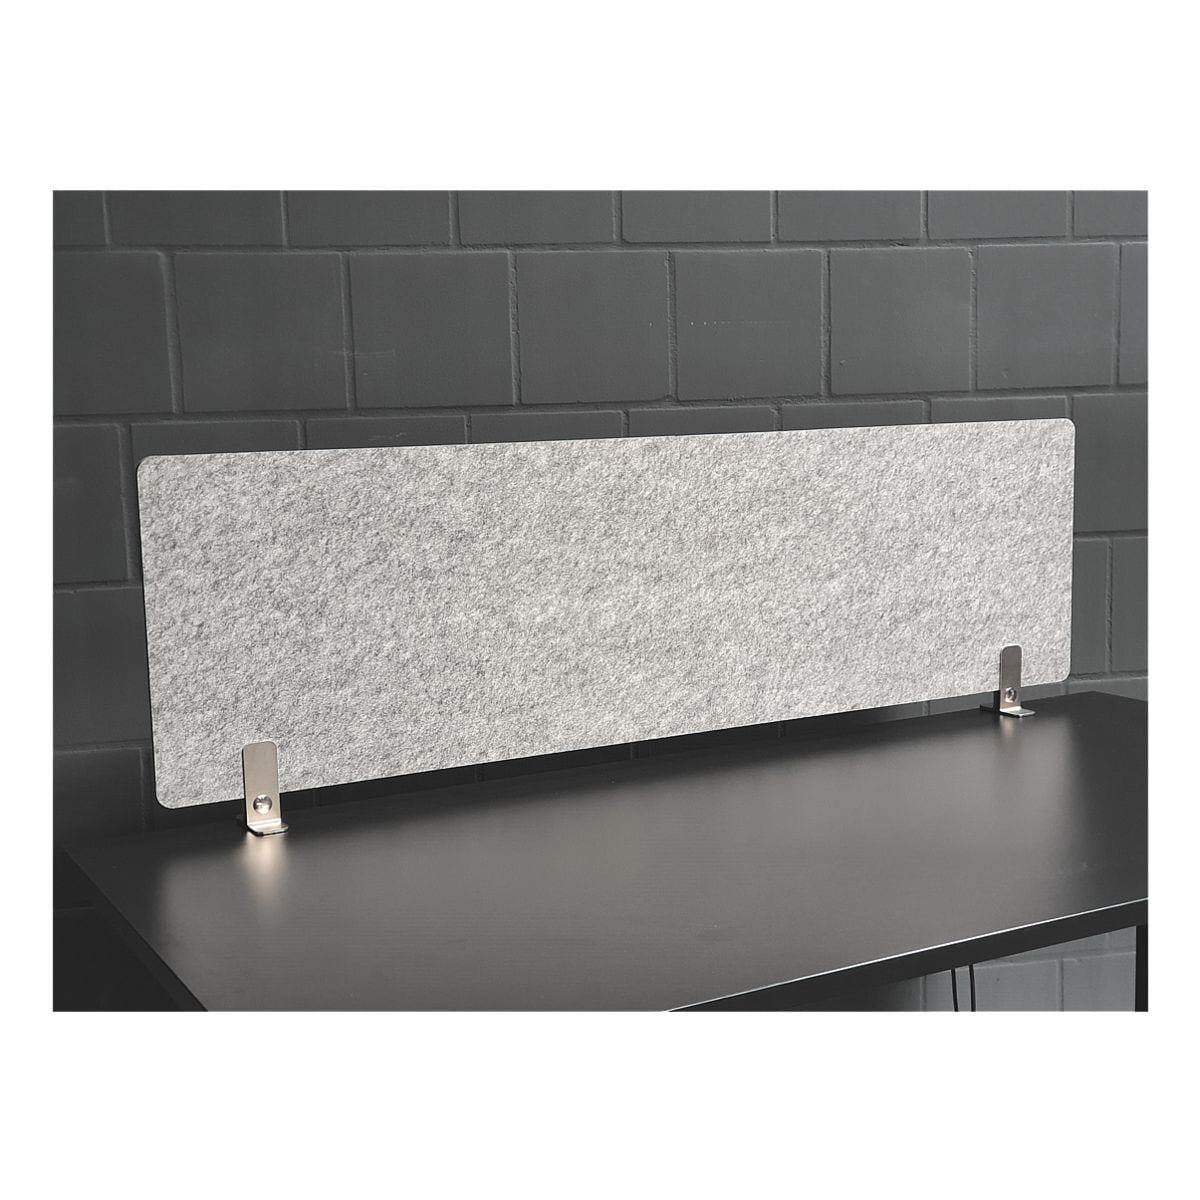 actiforce Trennwand »Acoustic Screen« large inkl. Halterung 150 x 40 cm